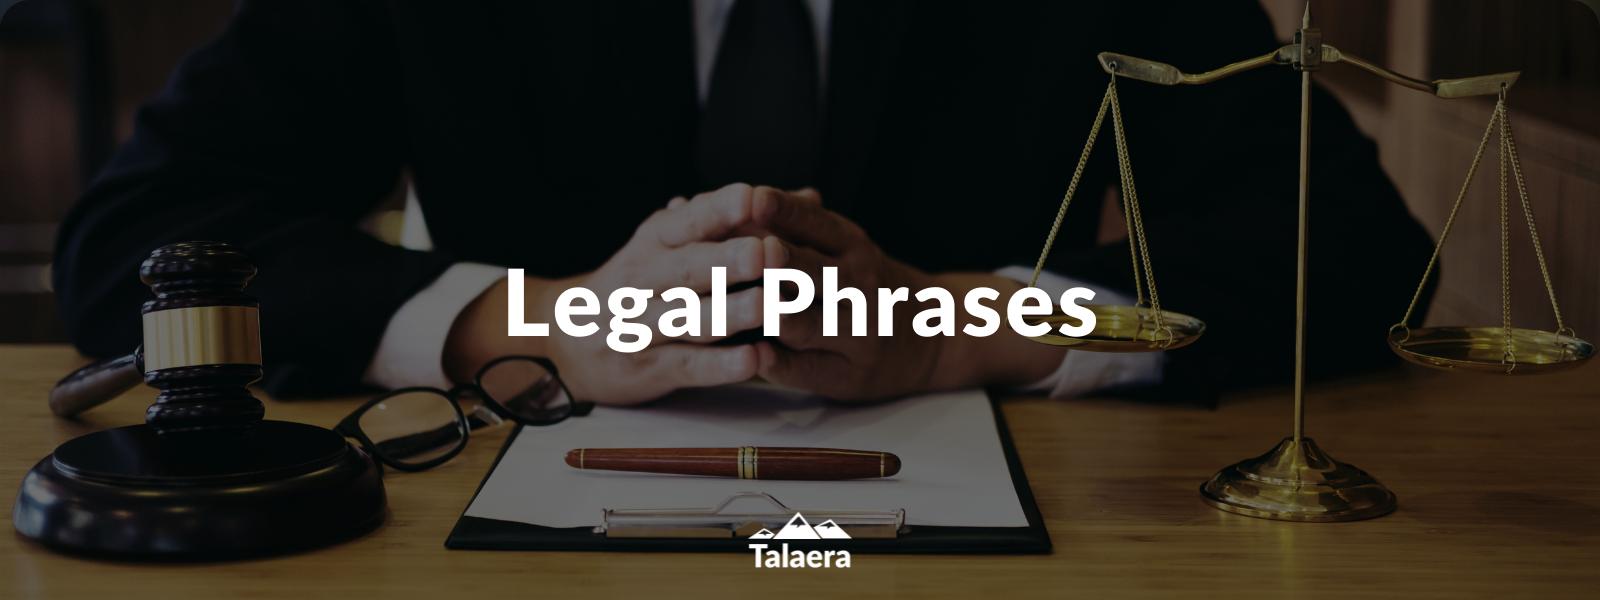 Legal Phrases - Talaera Business English